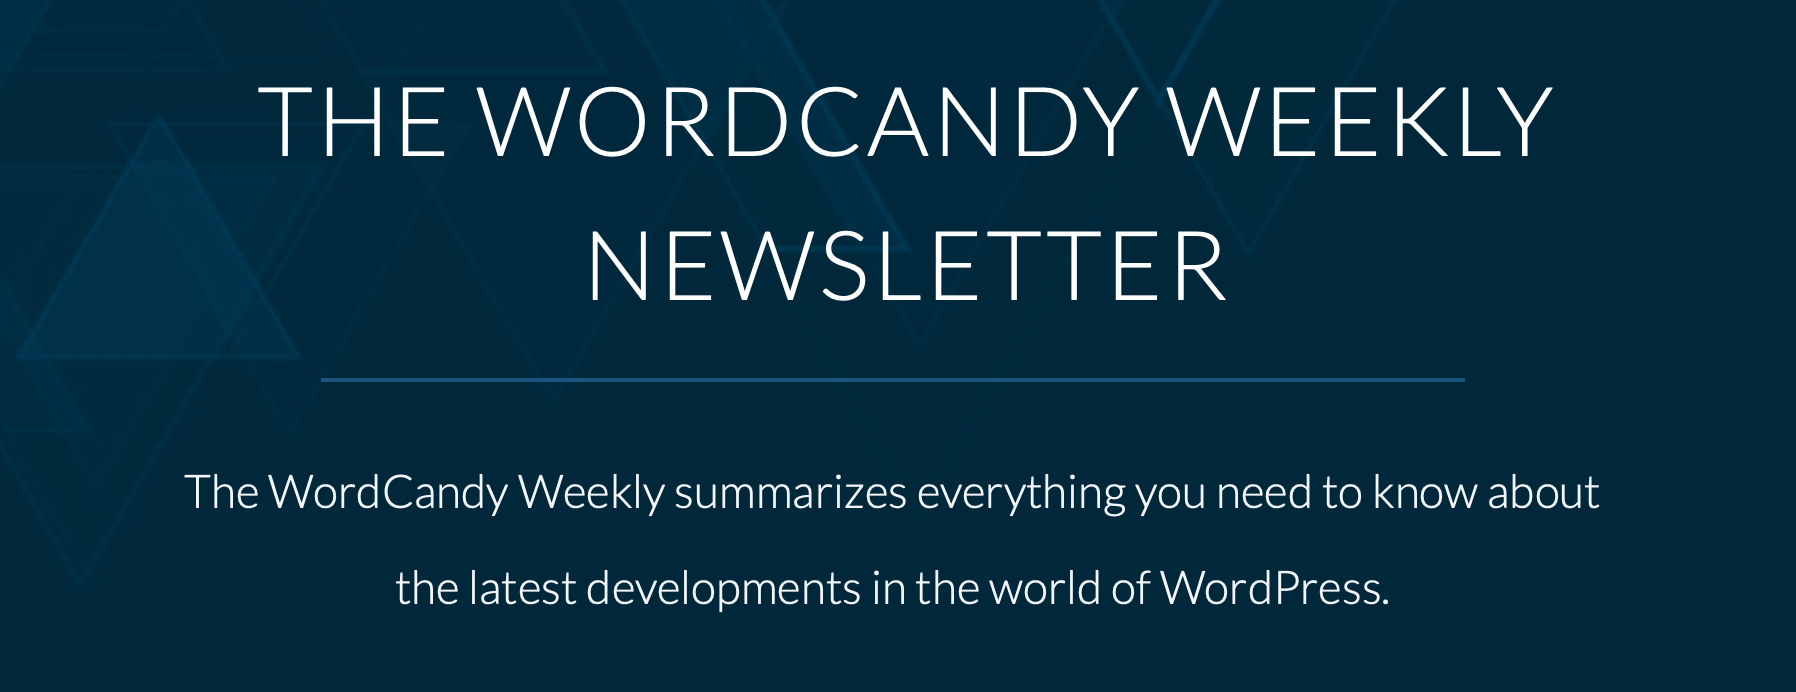 The WordCandy Weekly WordPress newsletter banner.